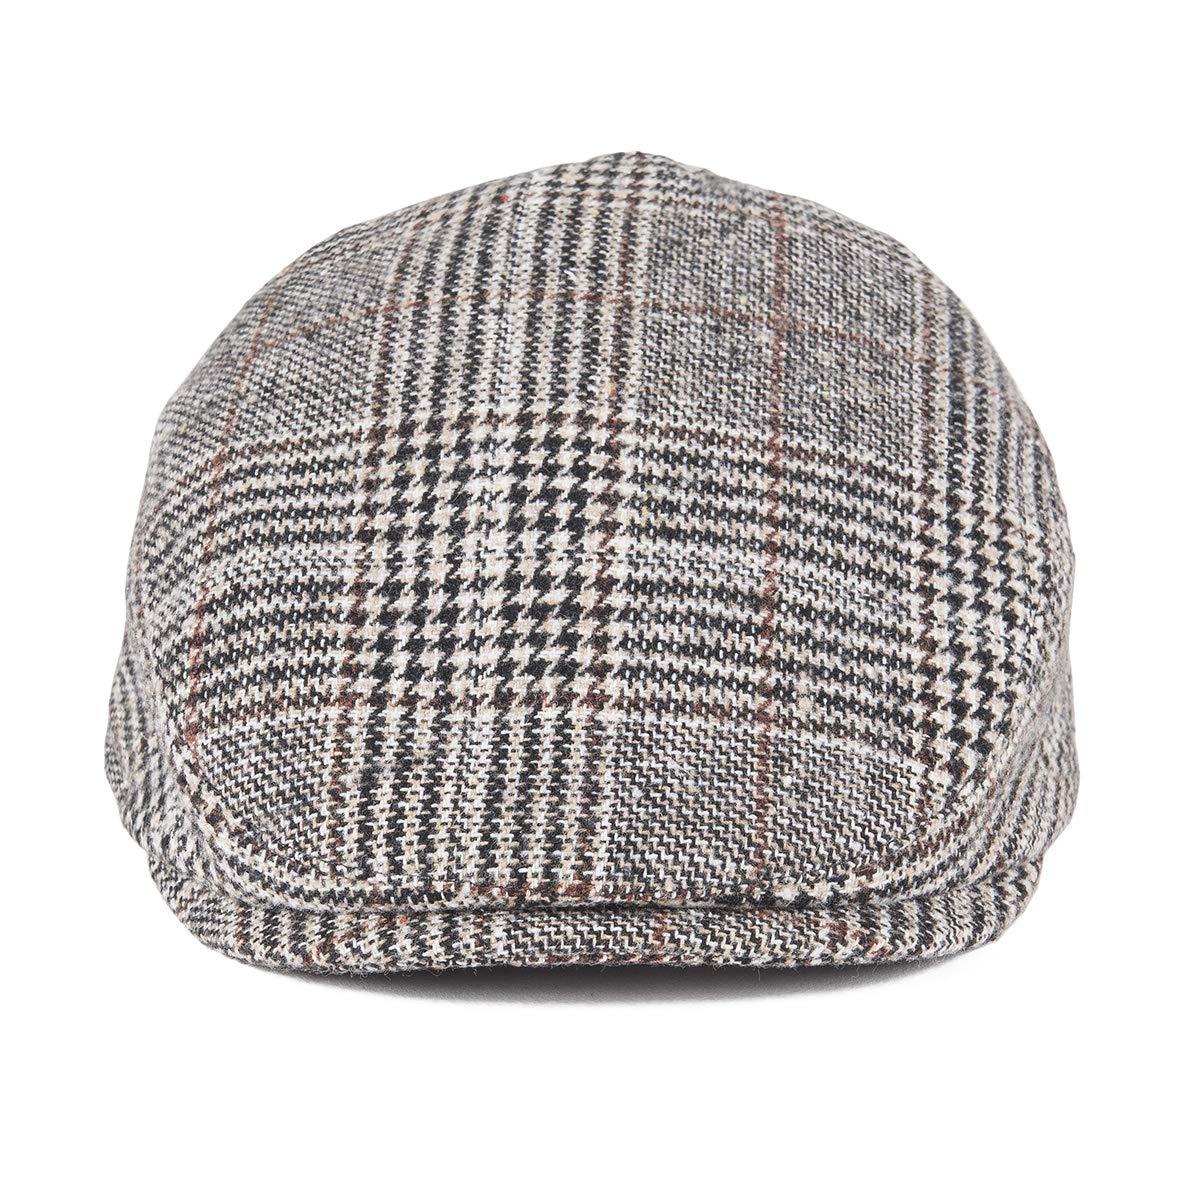 6adbfdc3 Amazon.com: JANGOUL Kids Wool Tweed Flat Cap Herringbone Boy Girl Newsboy Caps  Infant Toddler Child Youth Beret Hat Ivy Gatsby Cap: Clothing